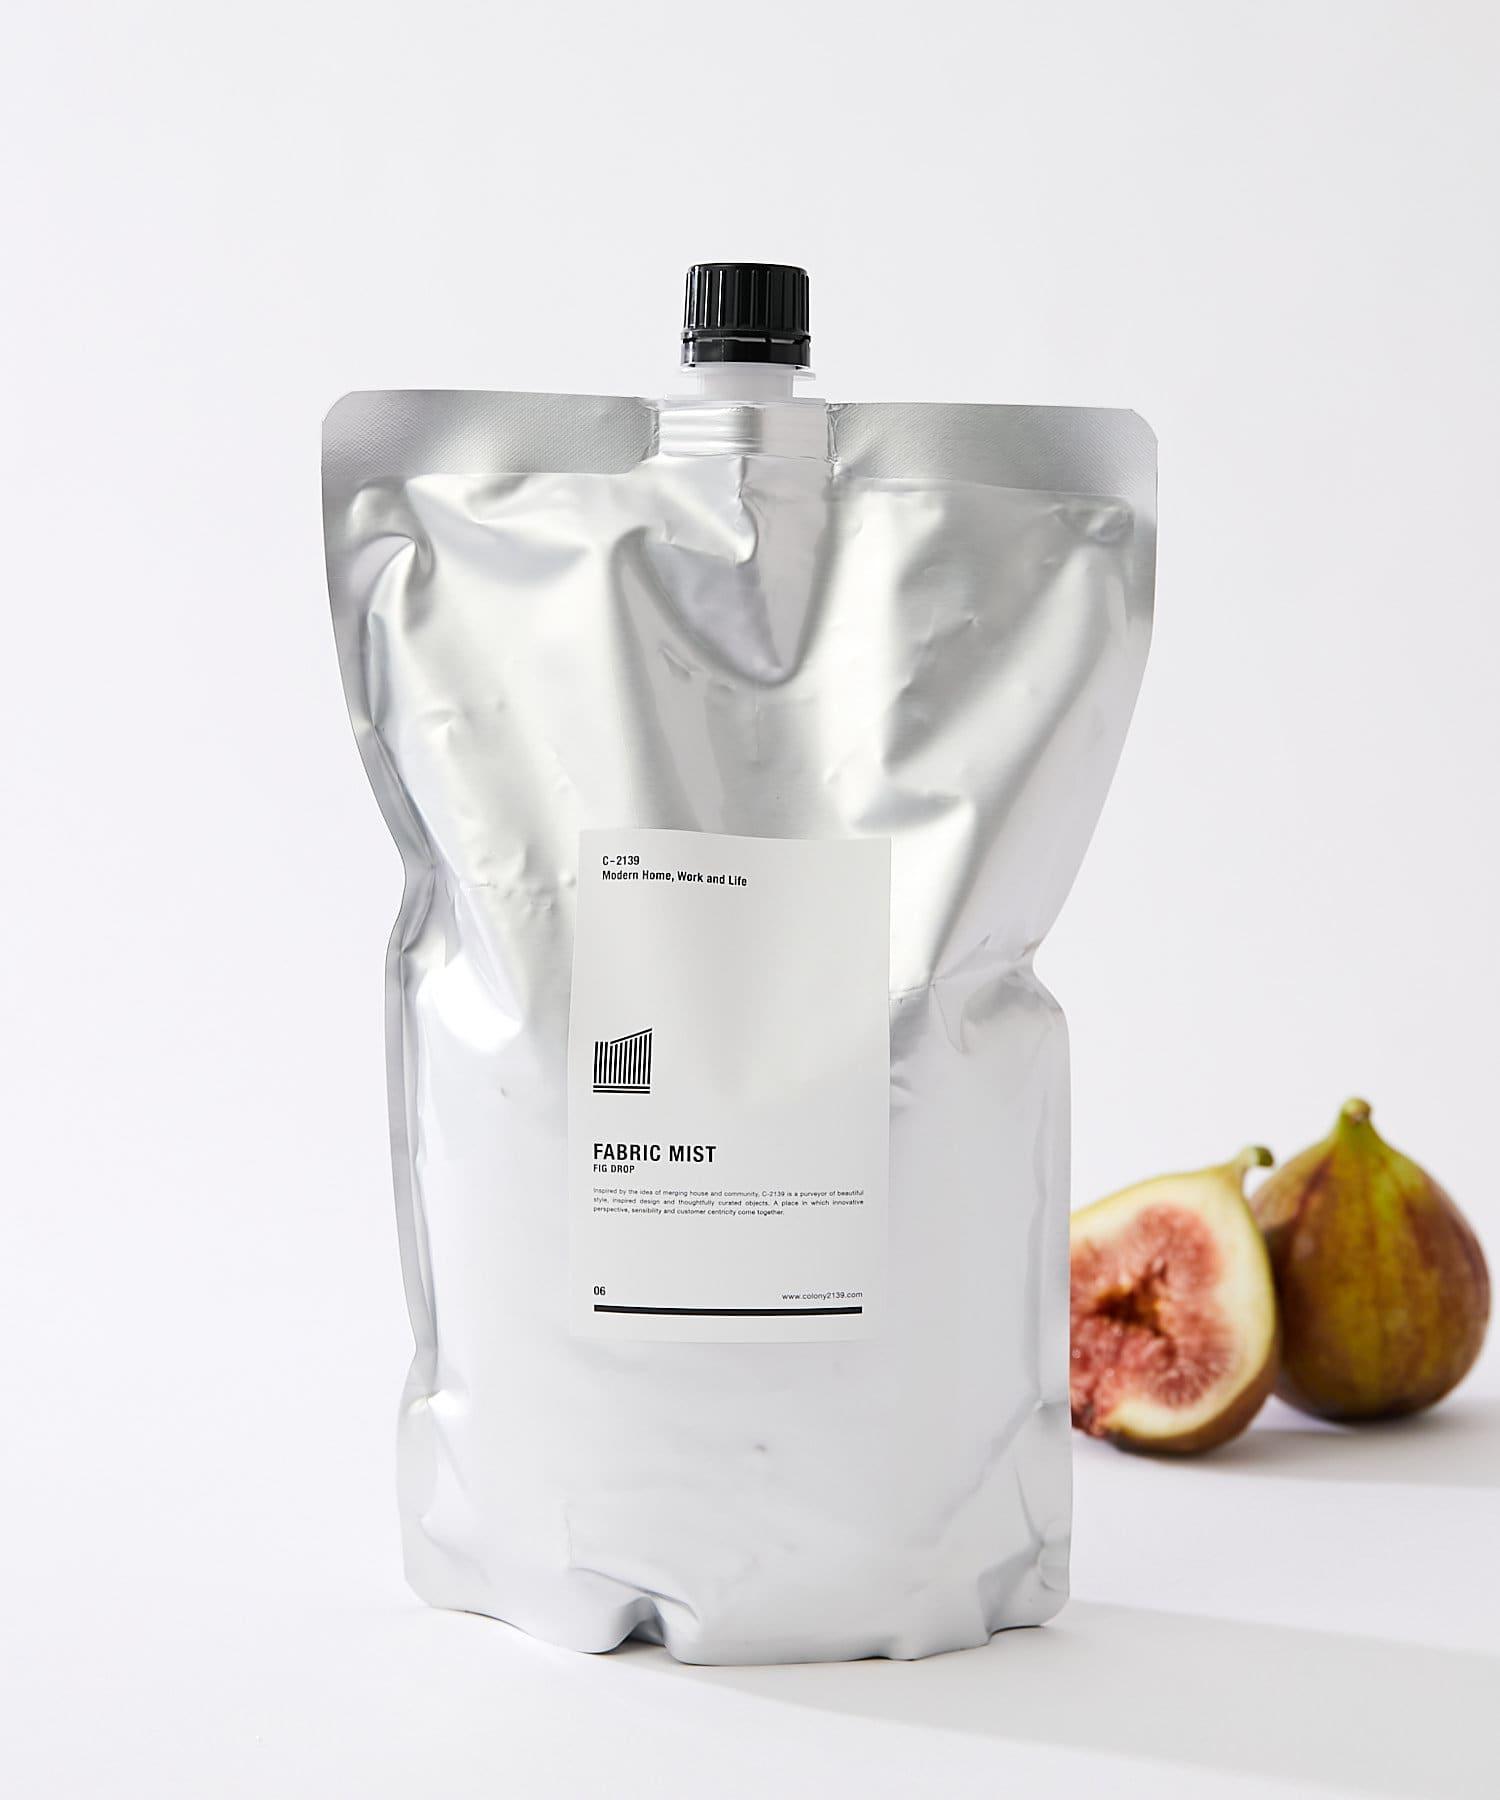 COLONY 2139(コロニー トゥーワンスリーナイン) COLONY 2139(コロニー トゥーワンスリーナイン) ファブリックミスト詰替用(フィグドロップの香り) シルバー